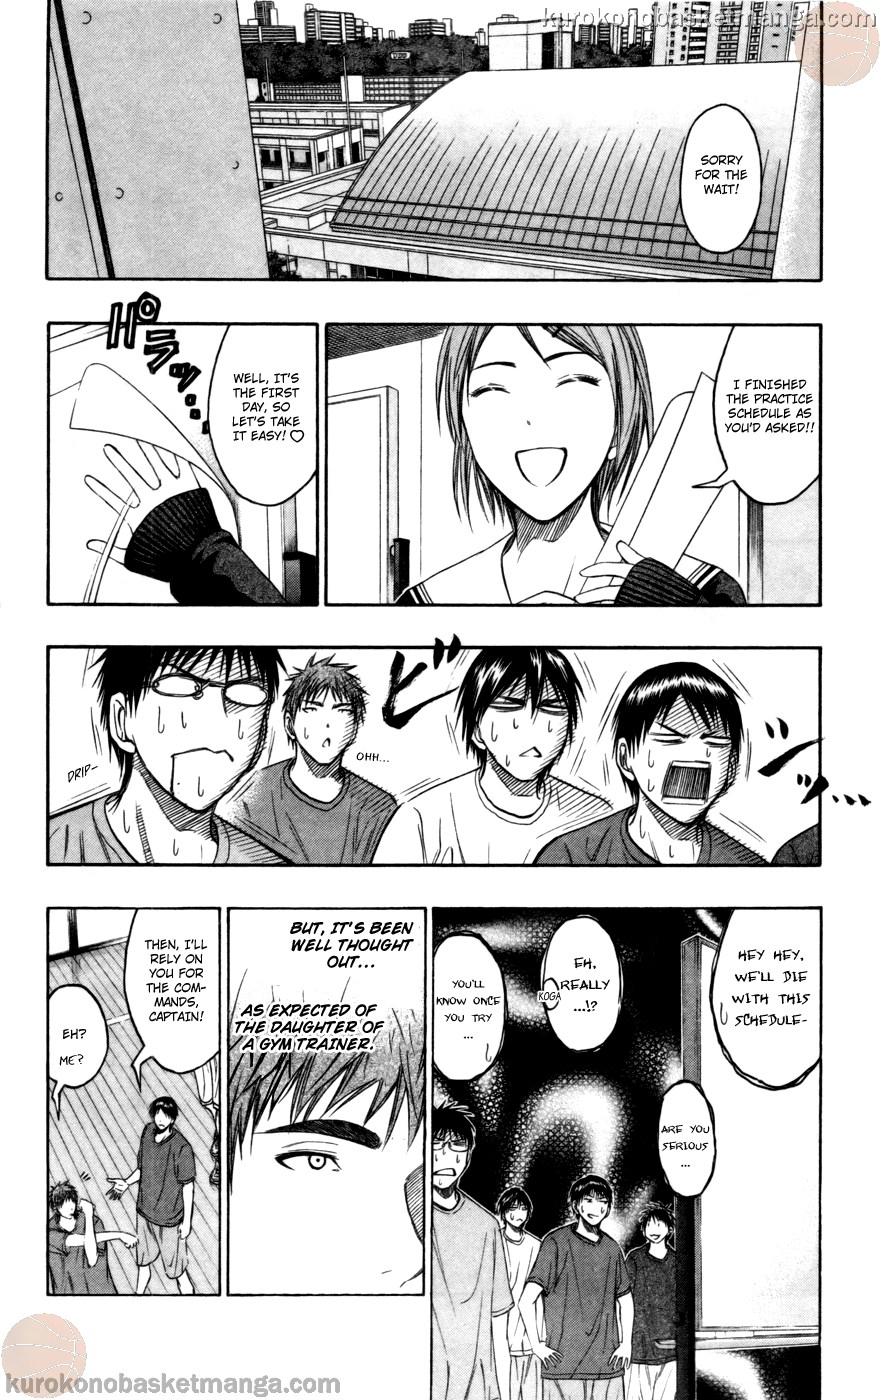 Kuroko no Basket Manga Chapter 97 - Image 12